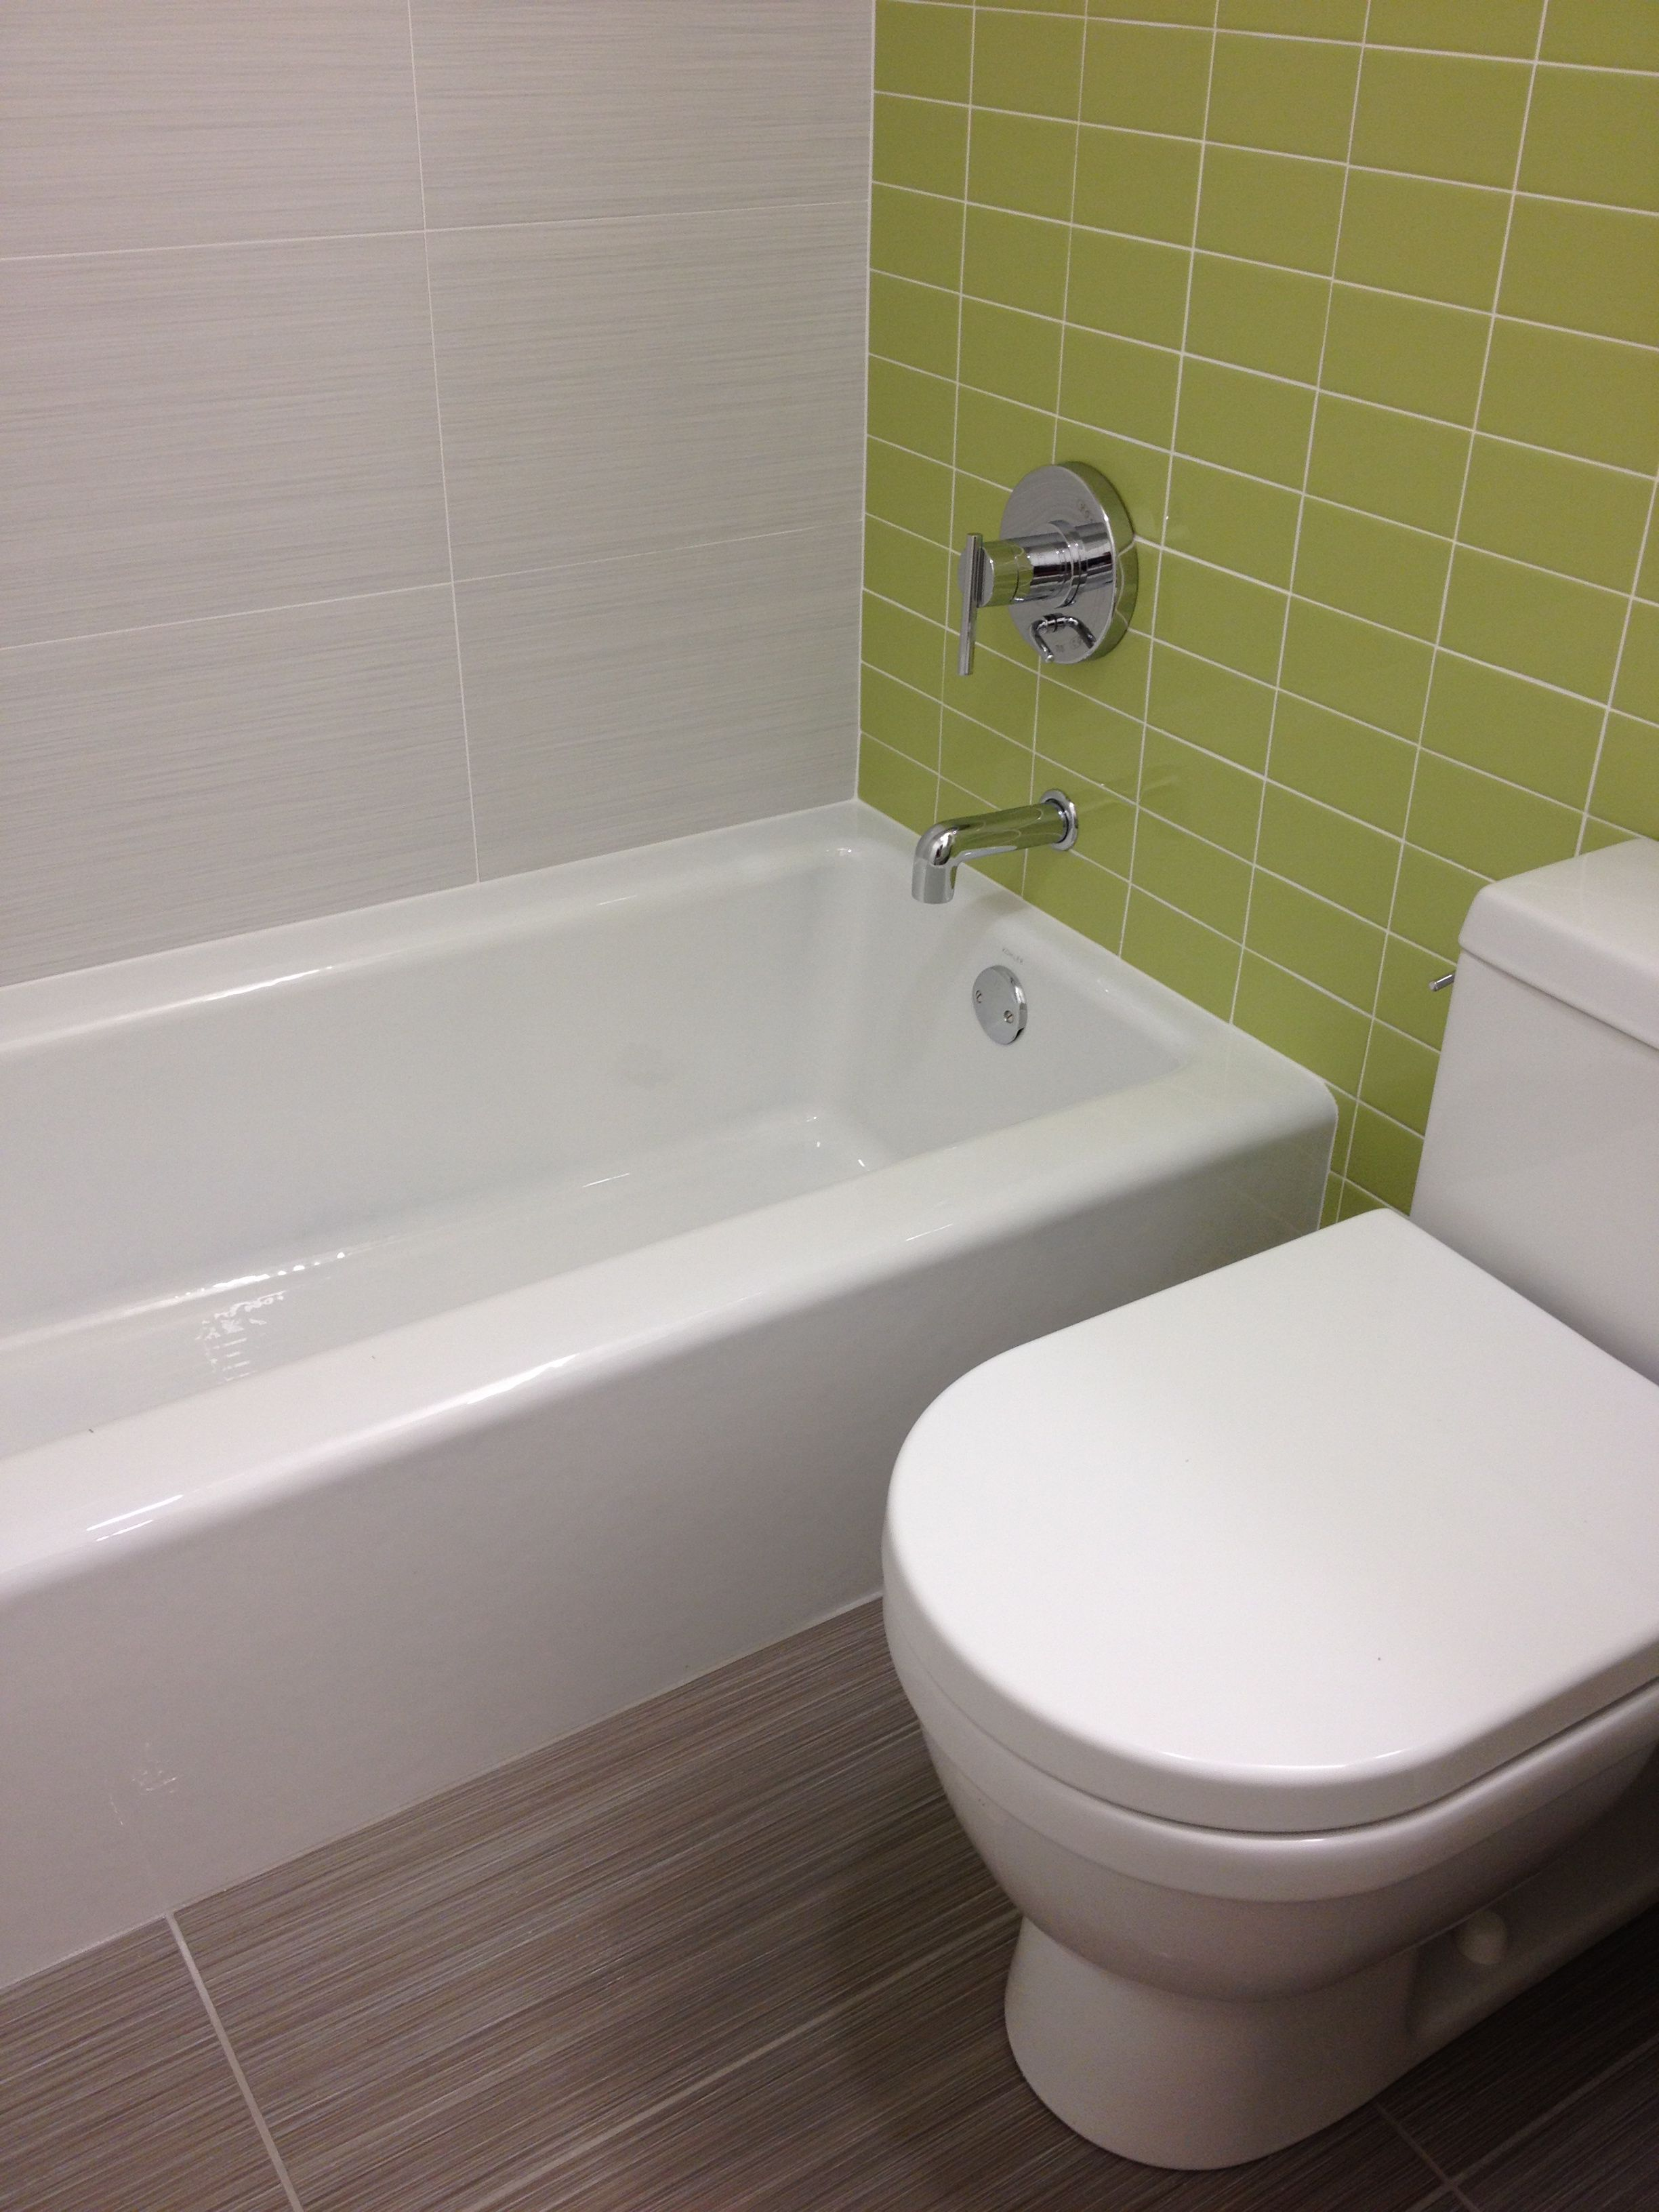 freestanding free today bathtub overstock aarhus product x shipping home garden oval